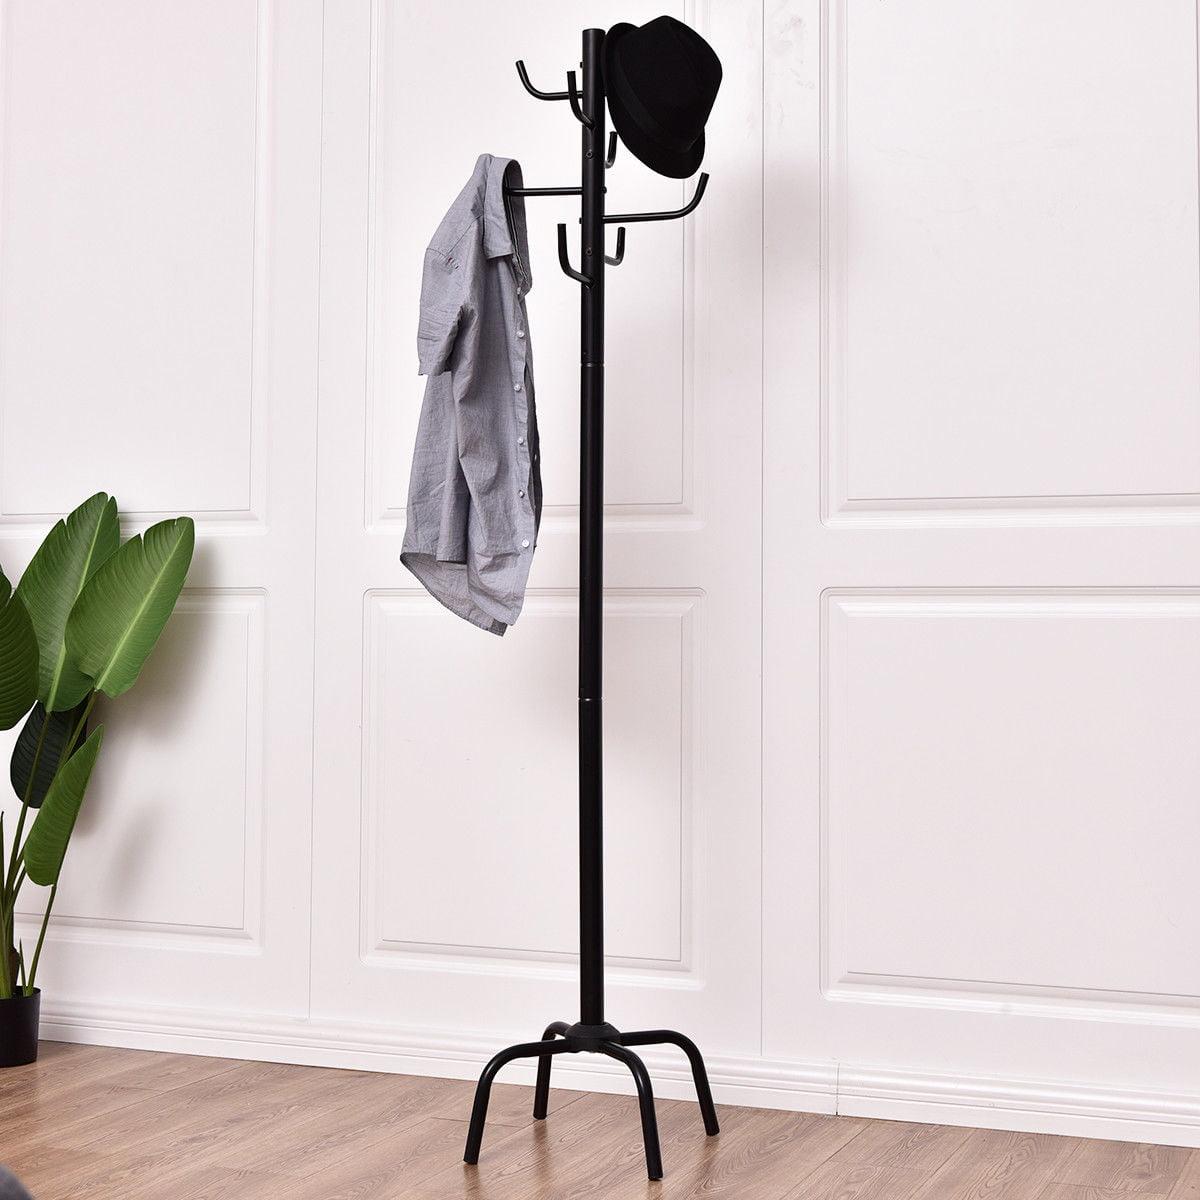 Gymax metal coat hat rack clothes hanger tree stand hall umbrella holder